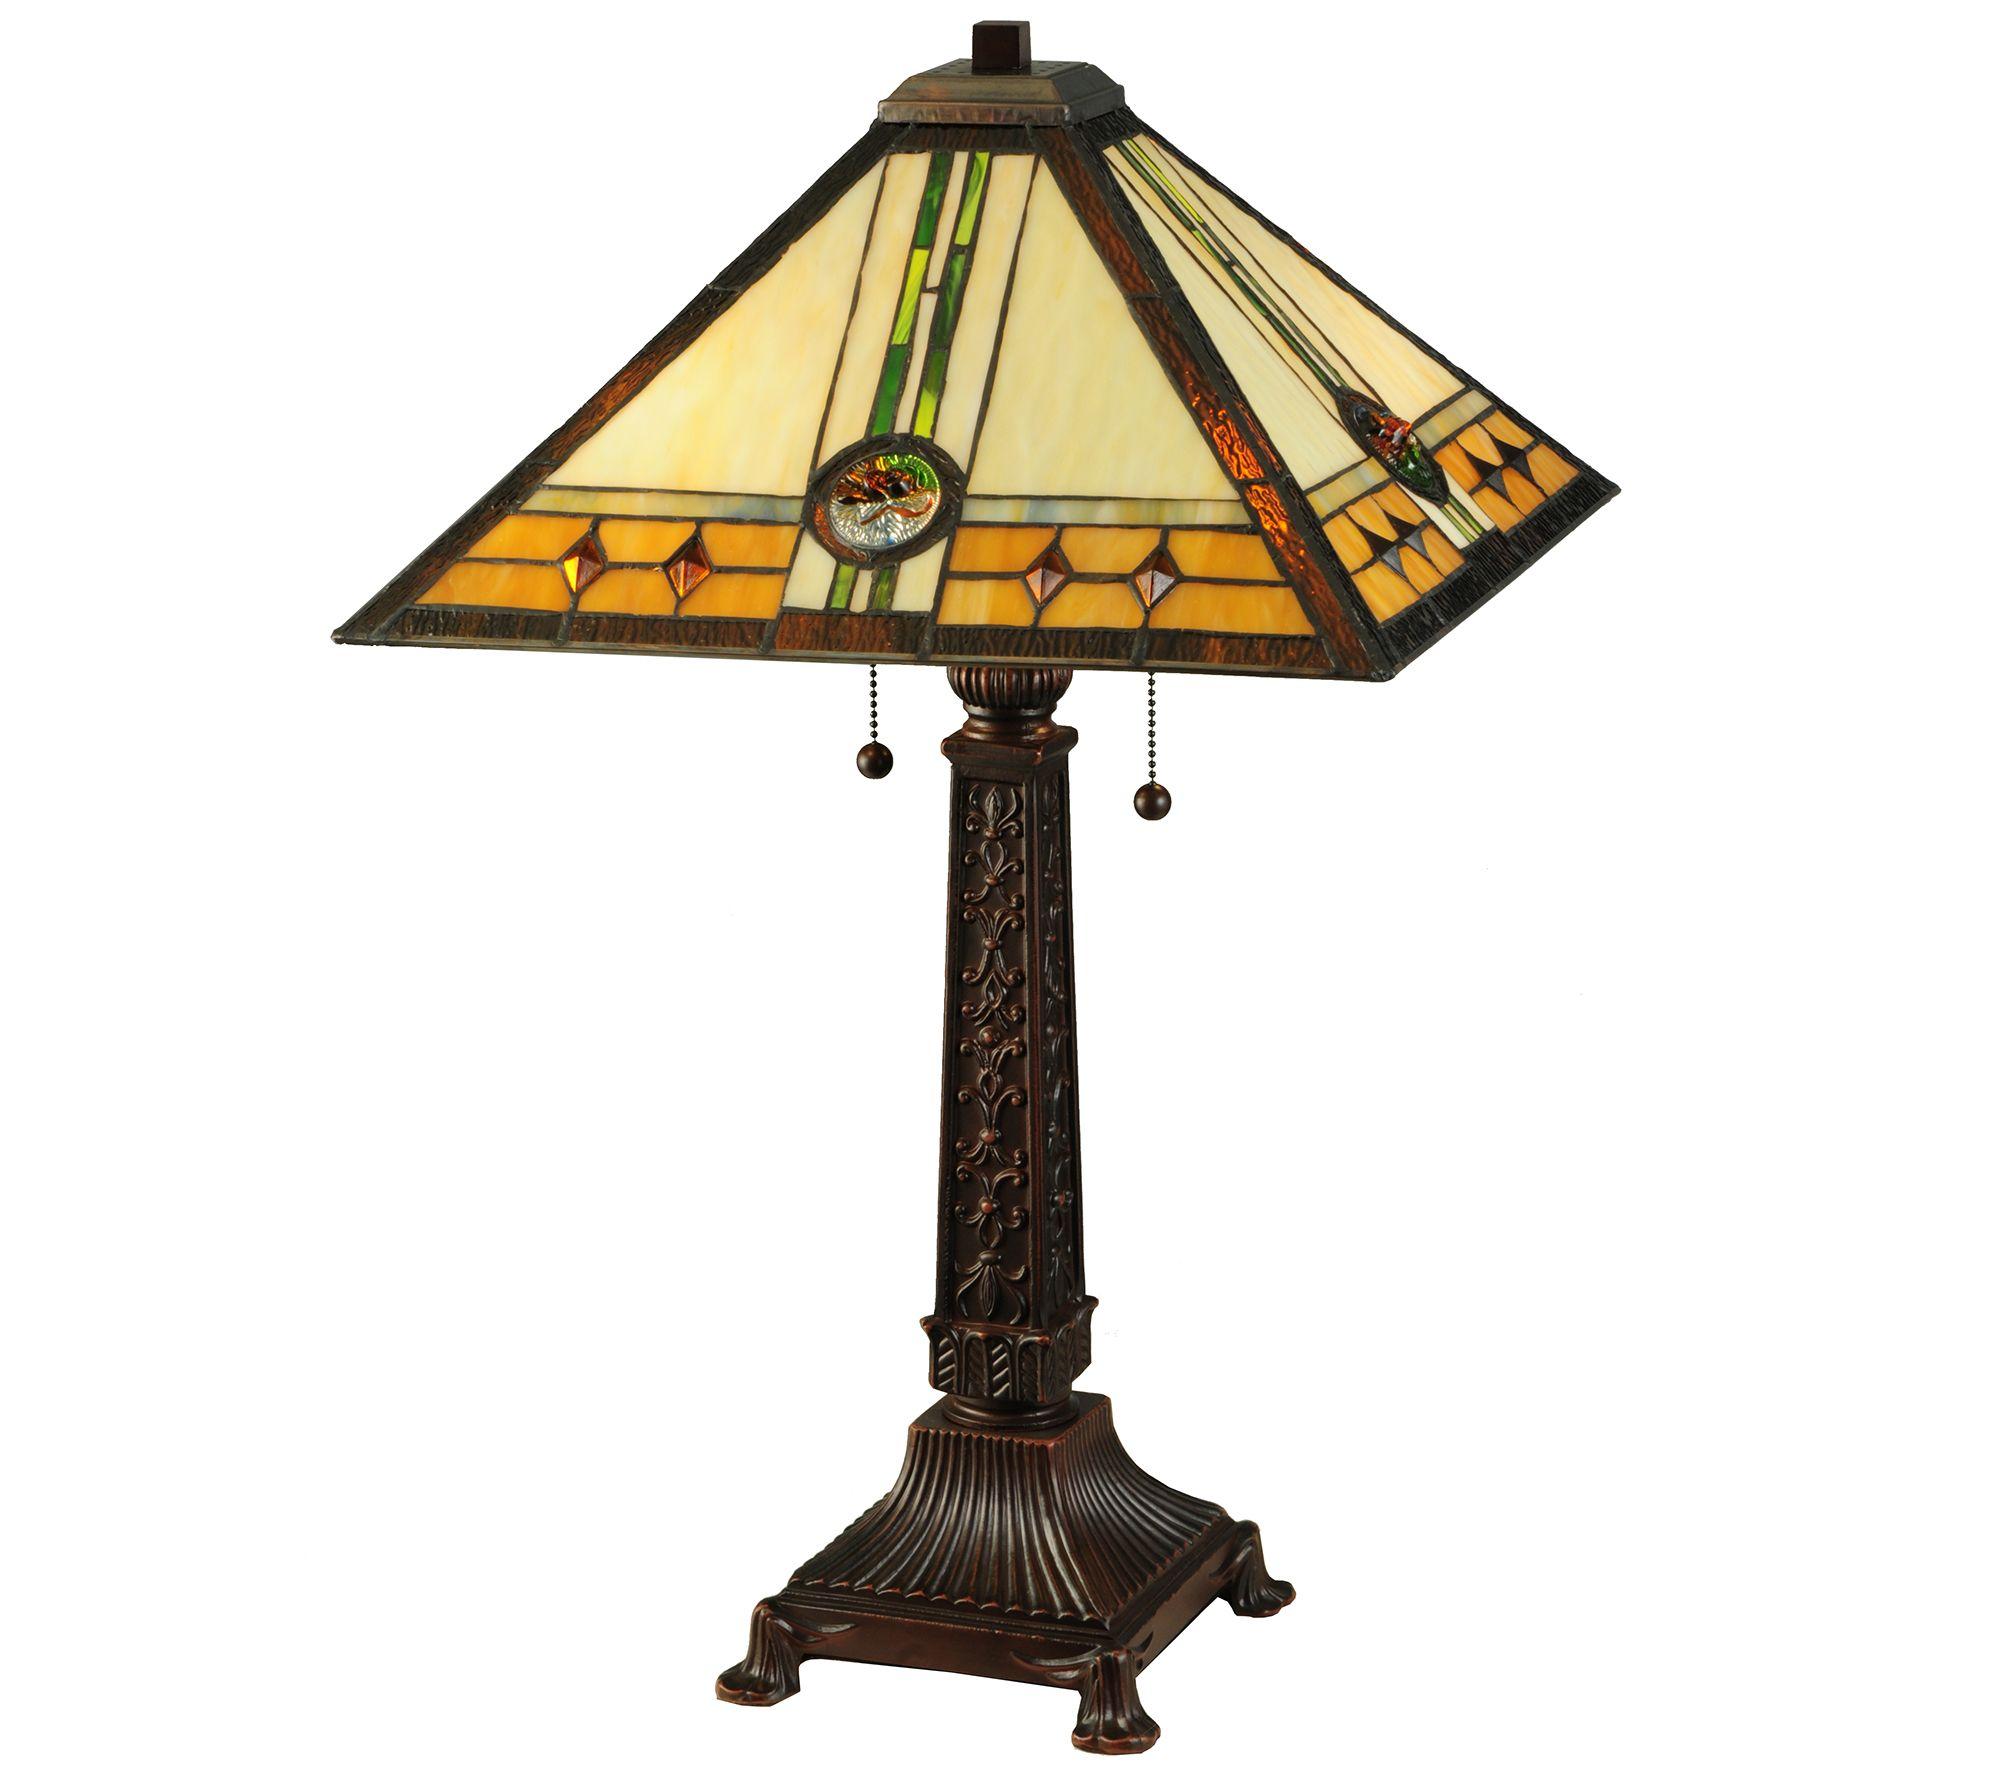 Meyda Tiffany Style Carlsbad Mission Table Lamp QVC